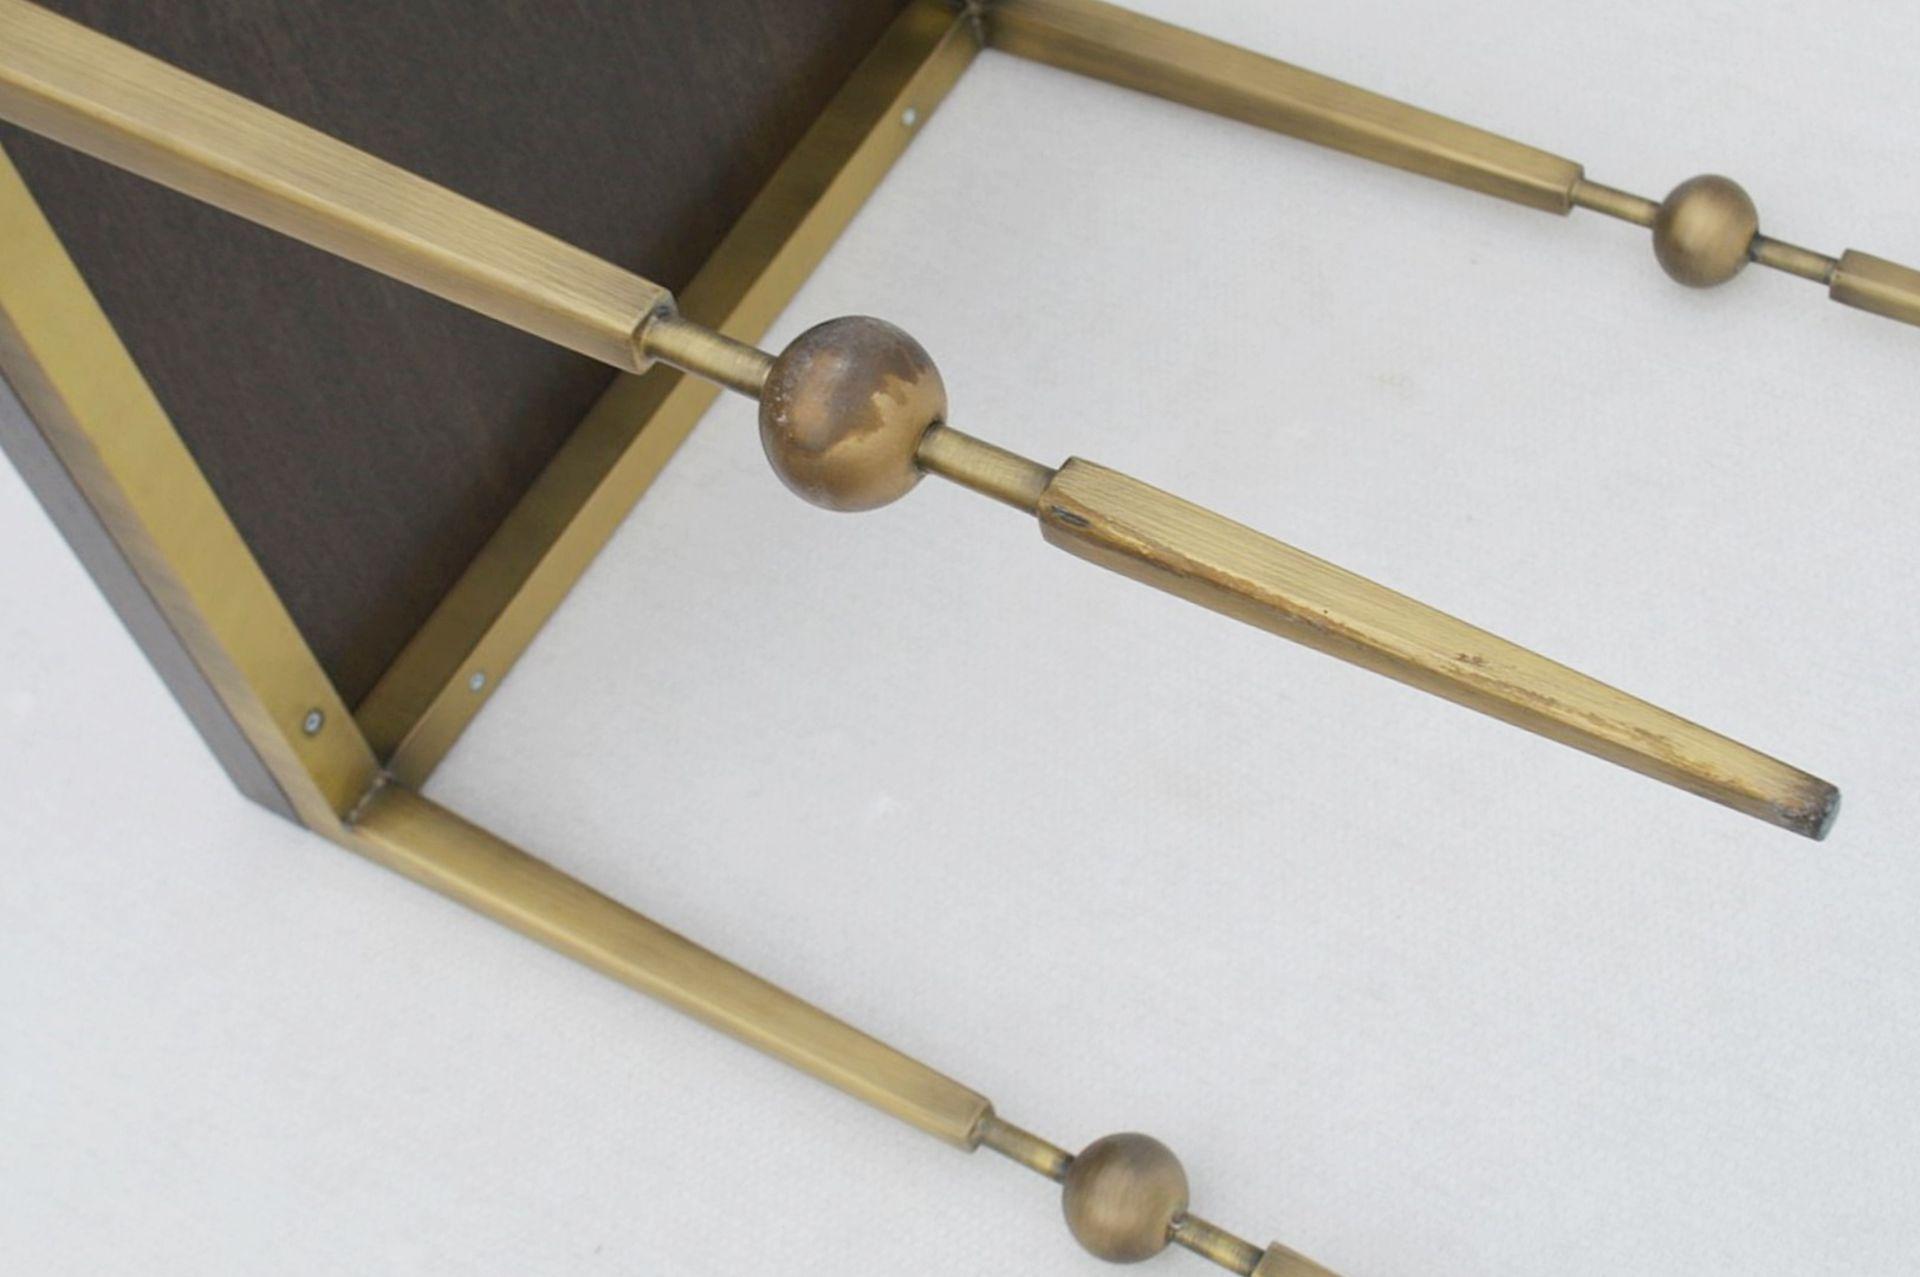 1 x JUSTIN VAN BREDA 'Sphere' Designer Occasional Table - Dimensions: H70 x W52 x D52cm - Ref: - Image 3 of 7